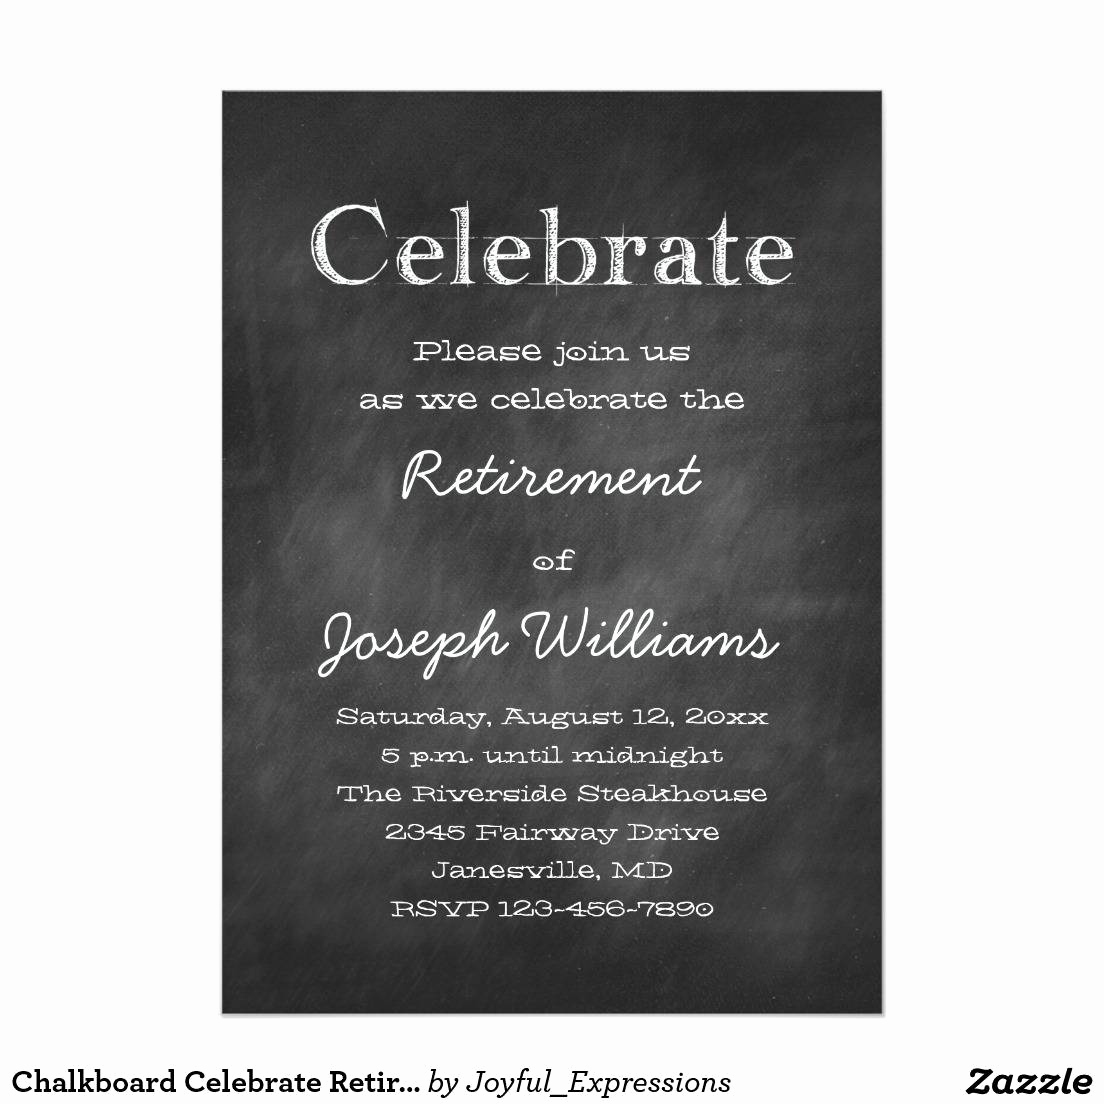 Retirement Invitation Template Free Elegant Invitation to A Retirement Party